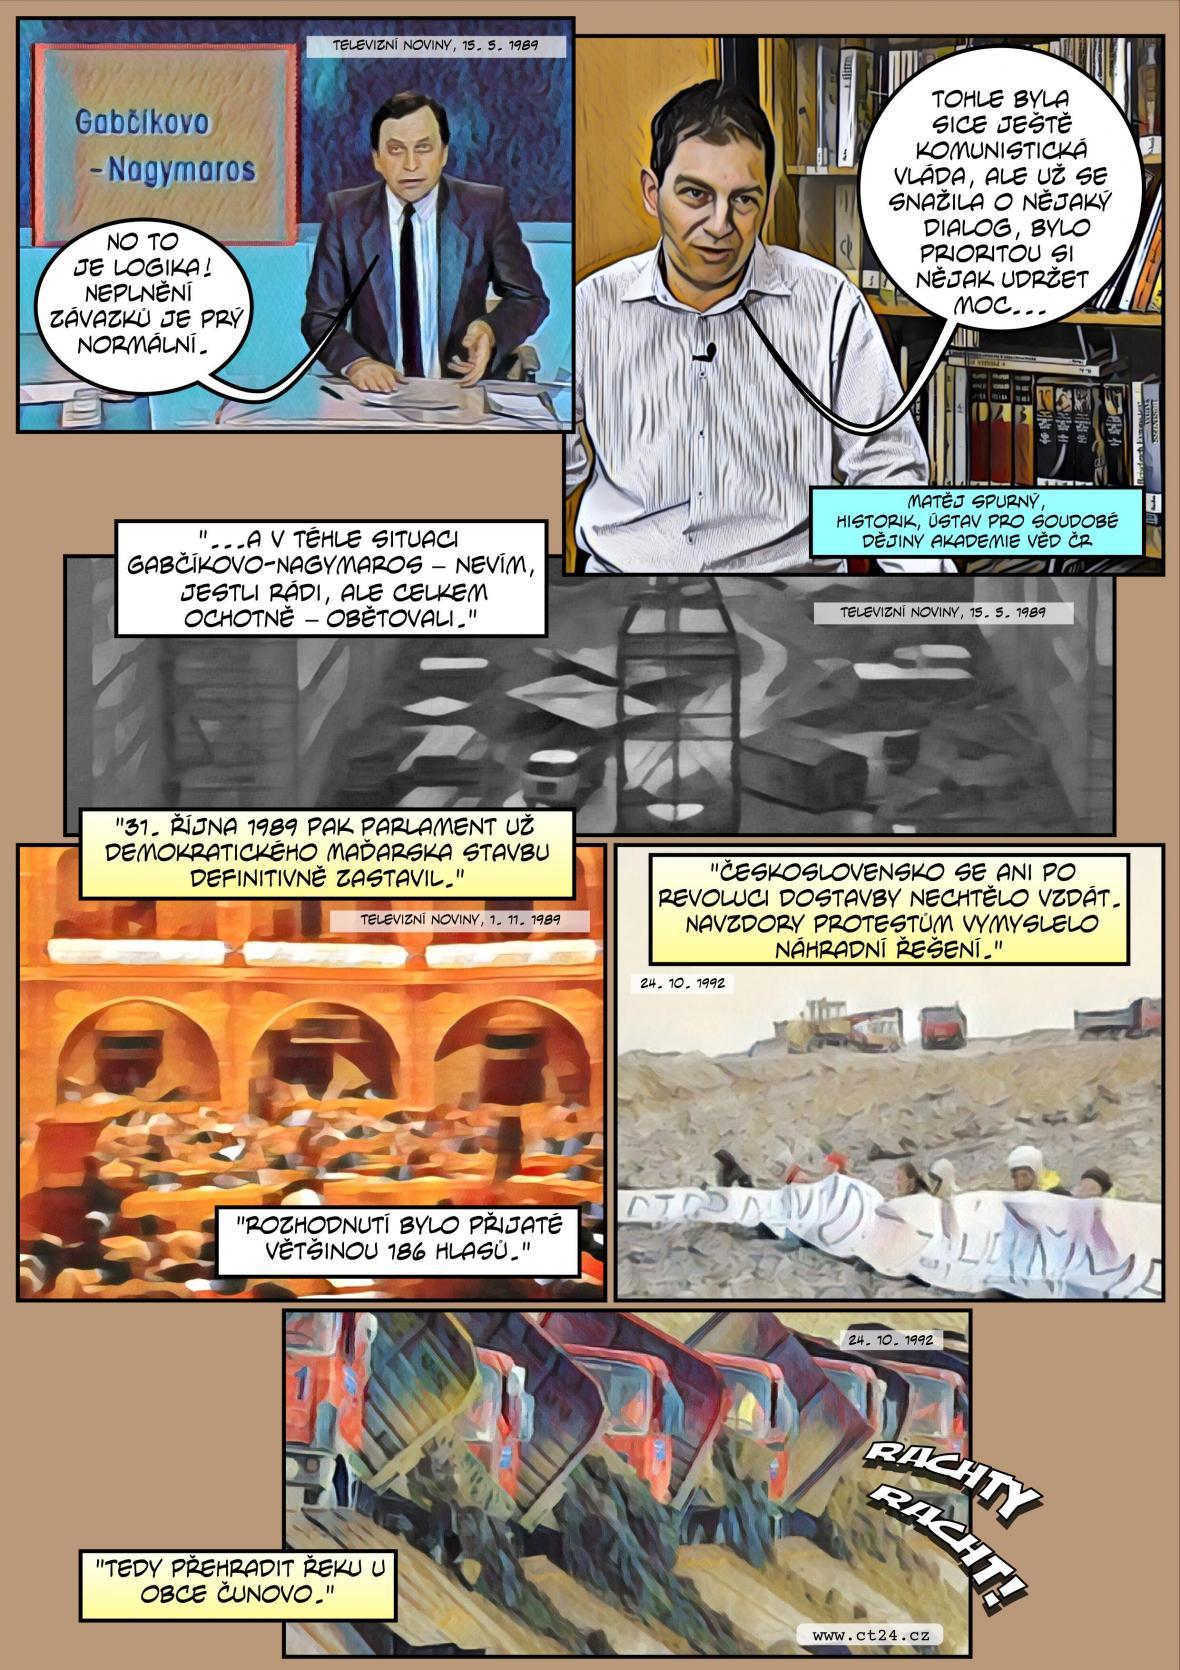 Komiks: 30 let dd pozastavení prací na projektu Gabčíkovo–Nagymaros